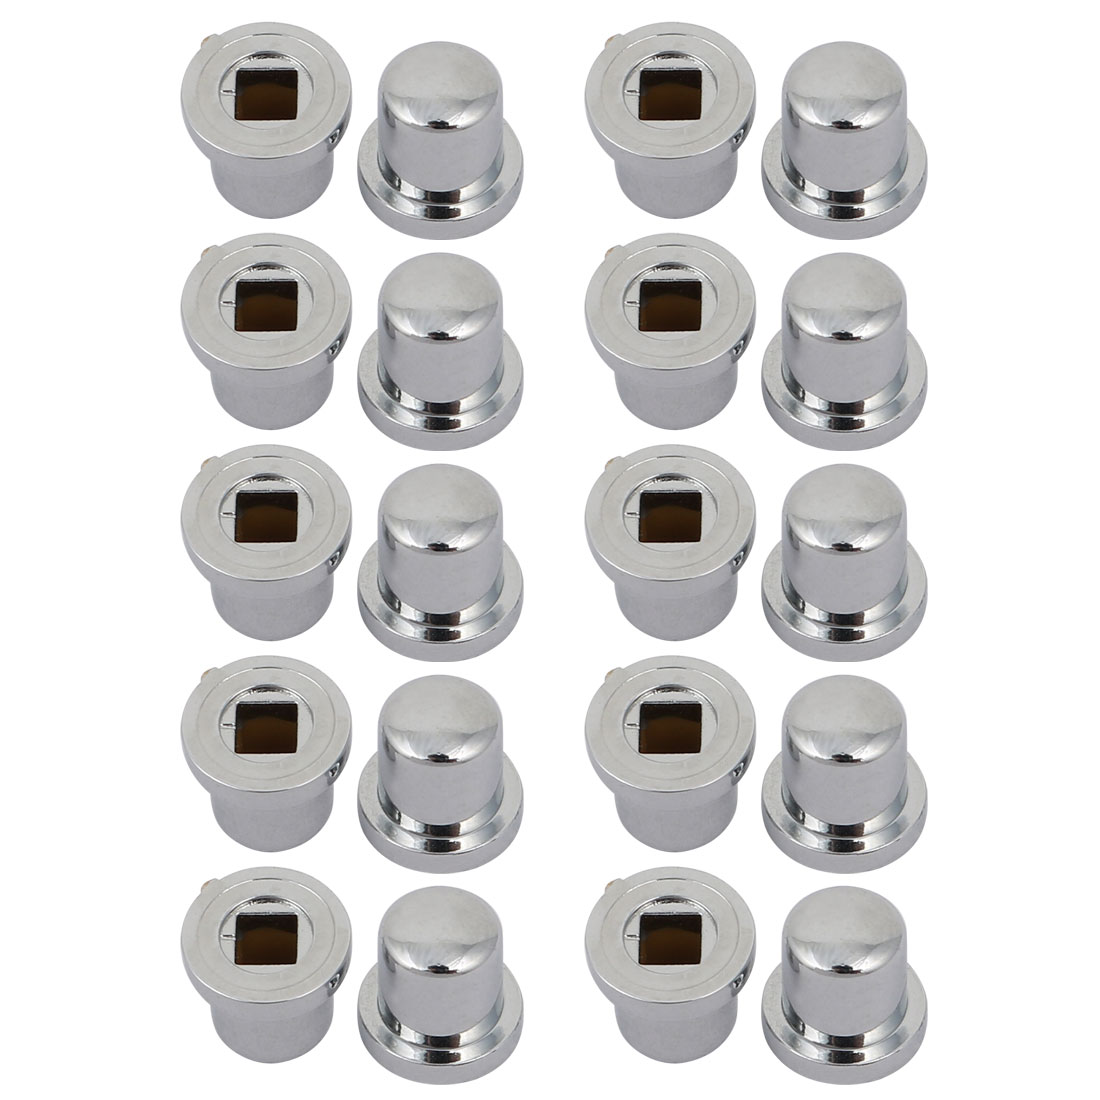 20pcs 10mm x 7.4mm x 9.5mm Plastic Potentiometer Volume Control Rotary Knob